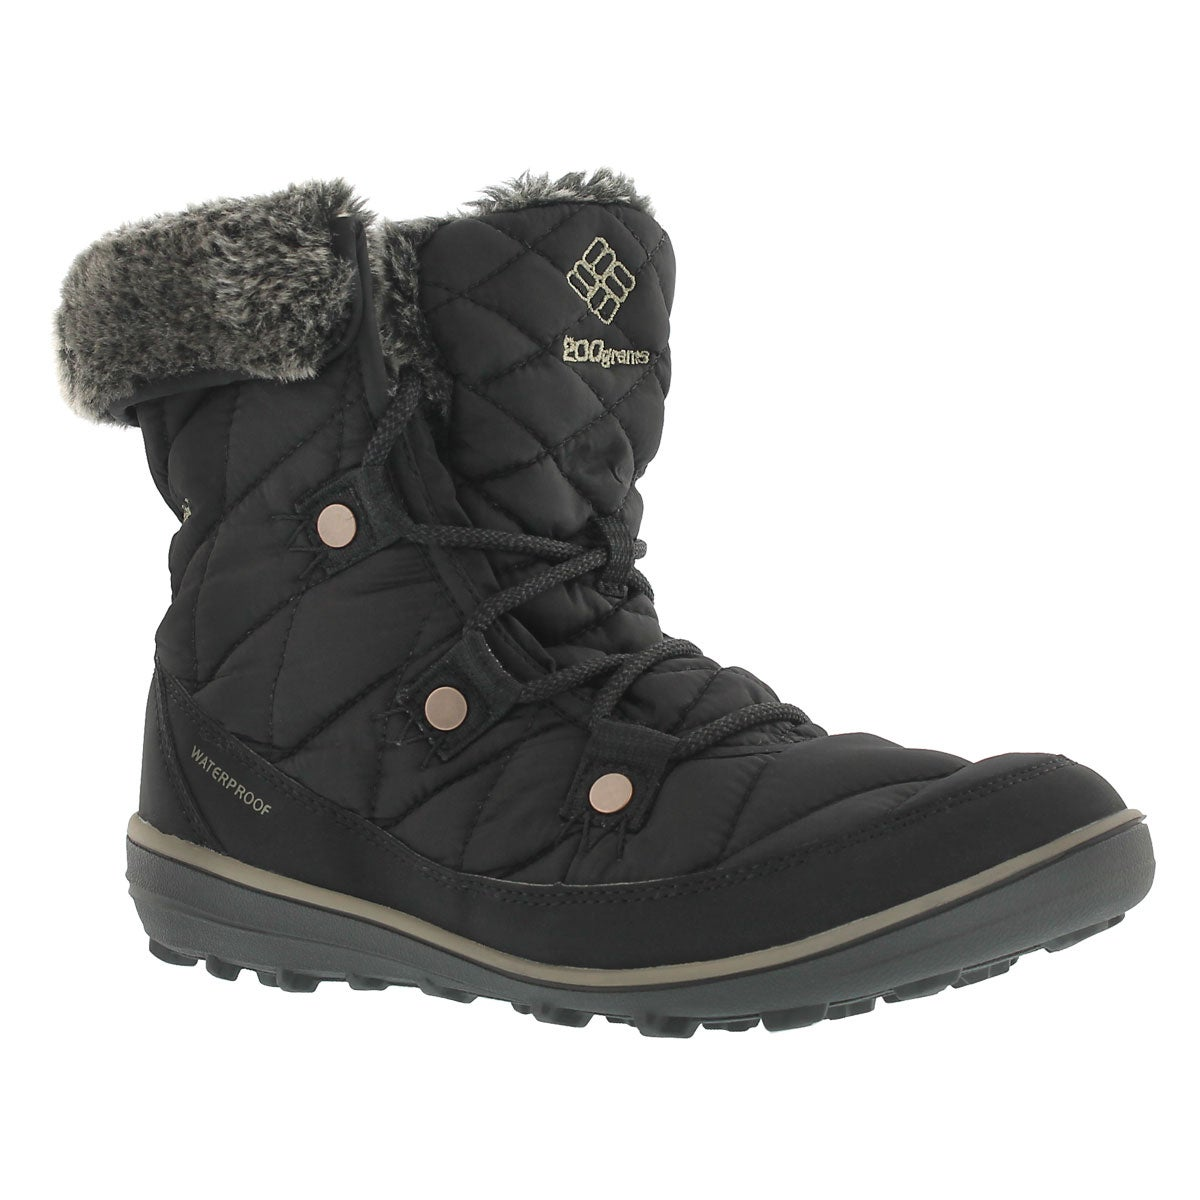 Lds Heavenly Shorty OmniHeat black boot